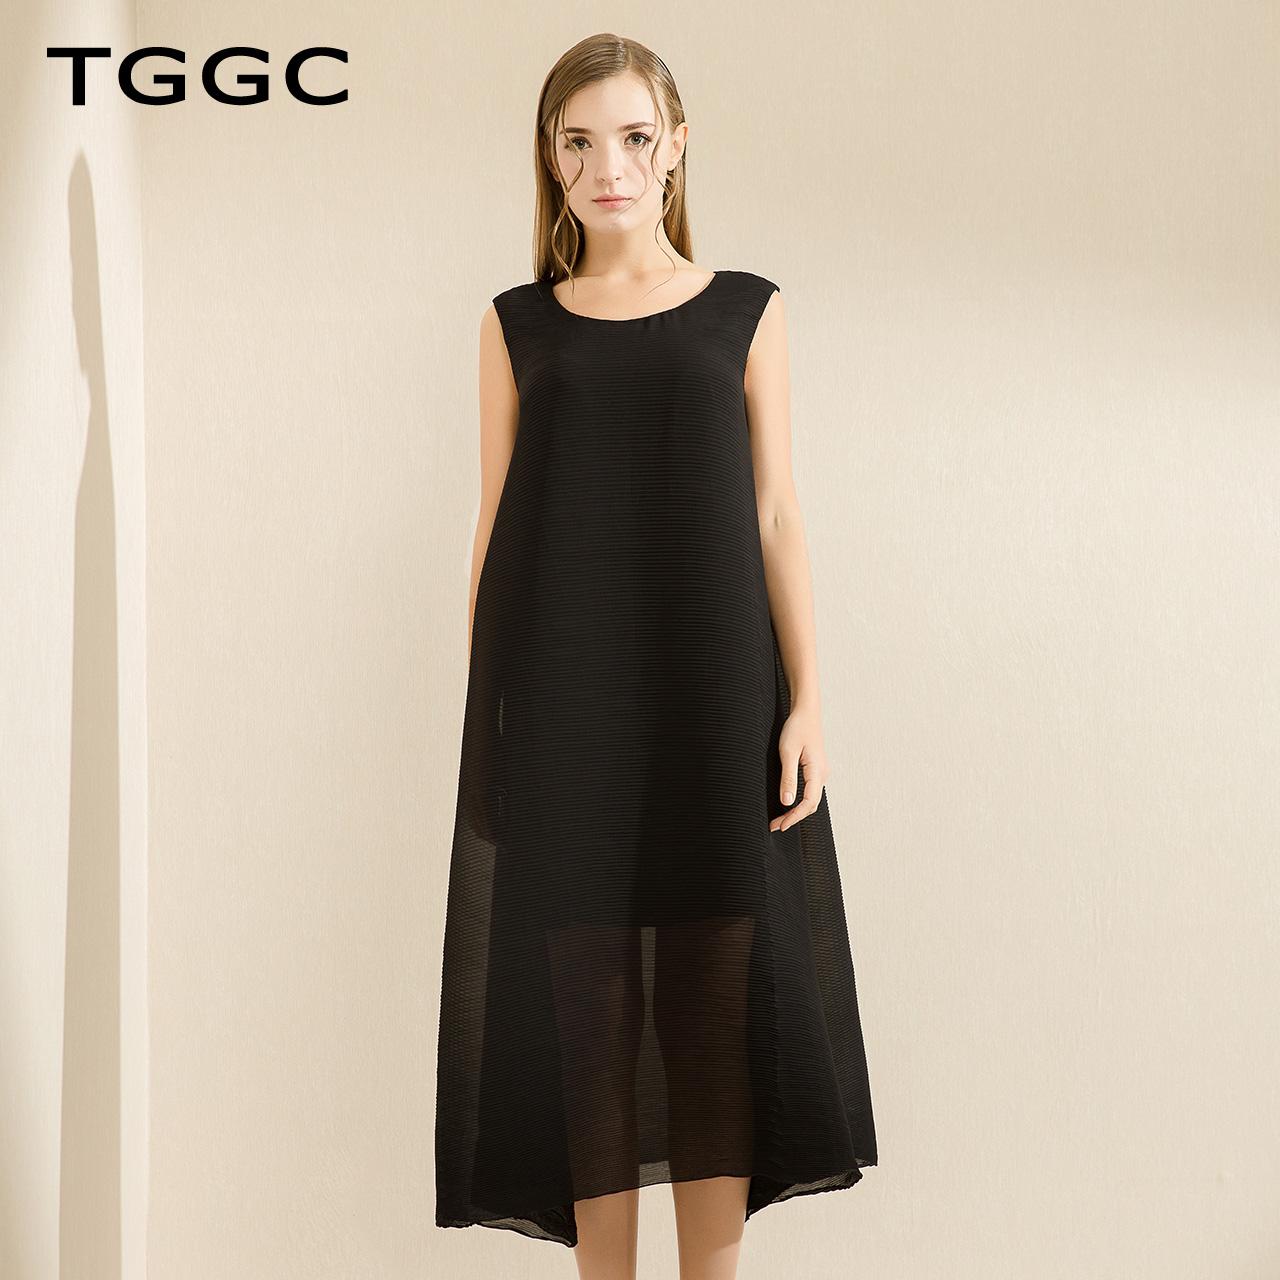 TGGC 2018春装休闲宽松纯色无袖气质雪纺长裙时尚女连衣裙ECF0078